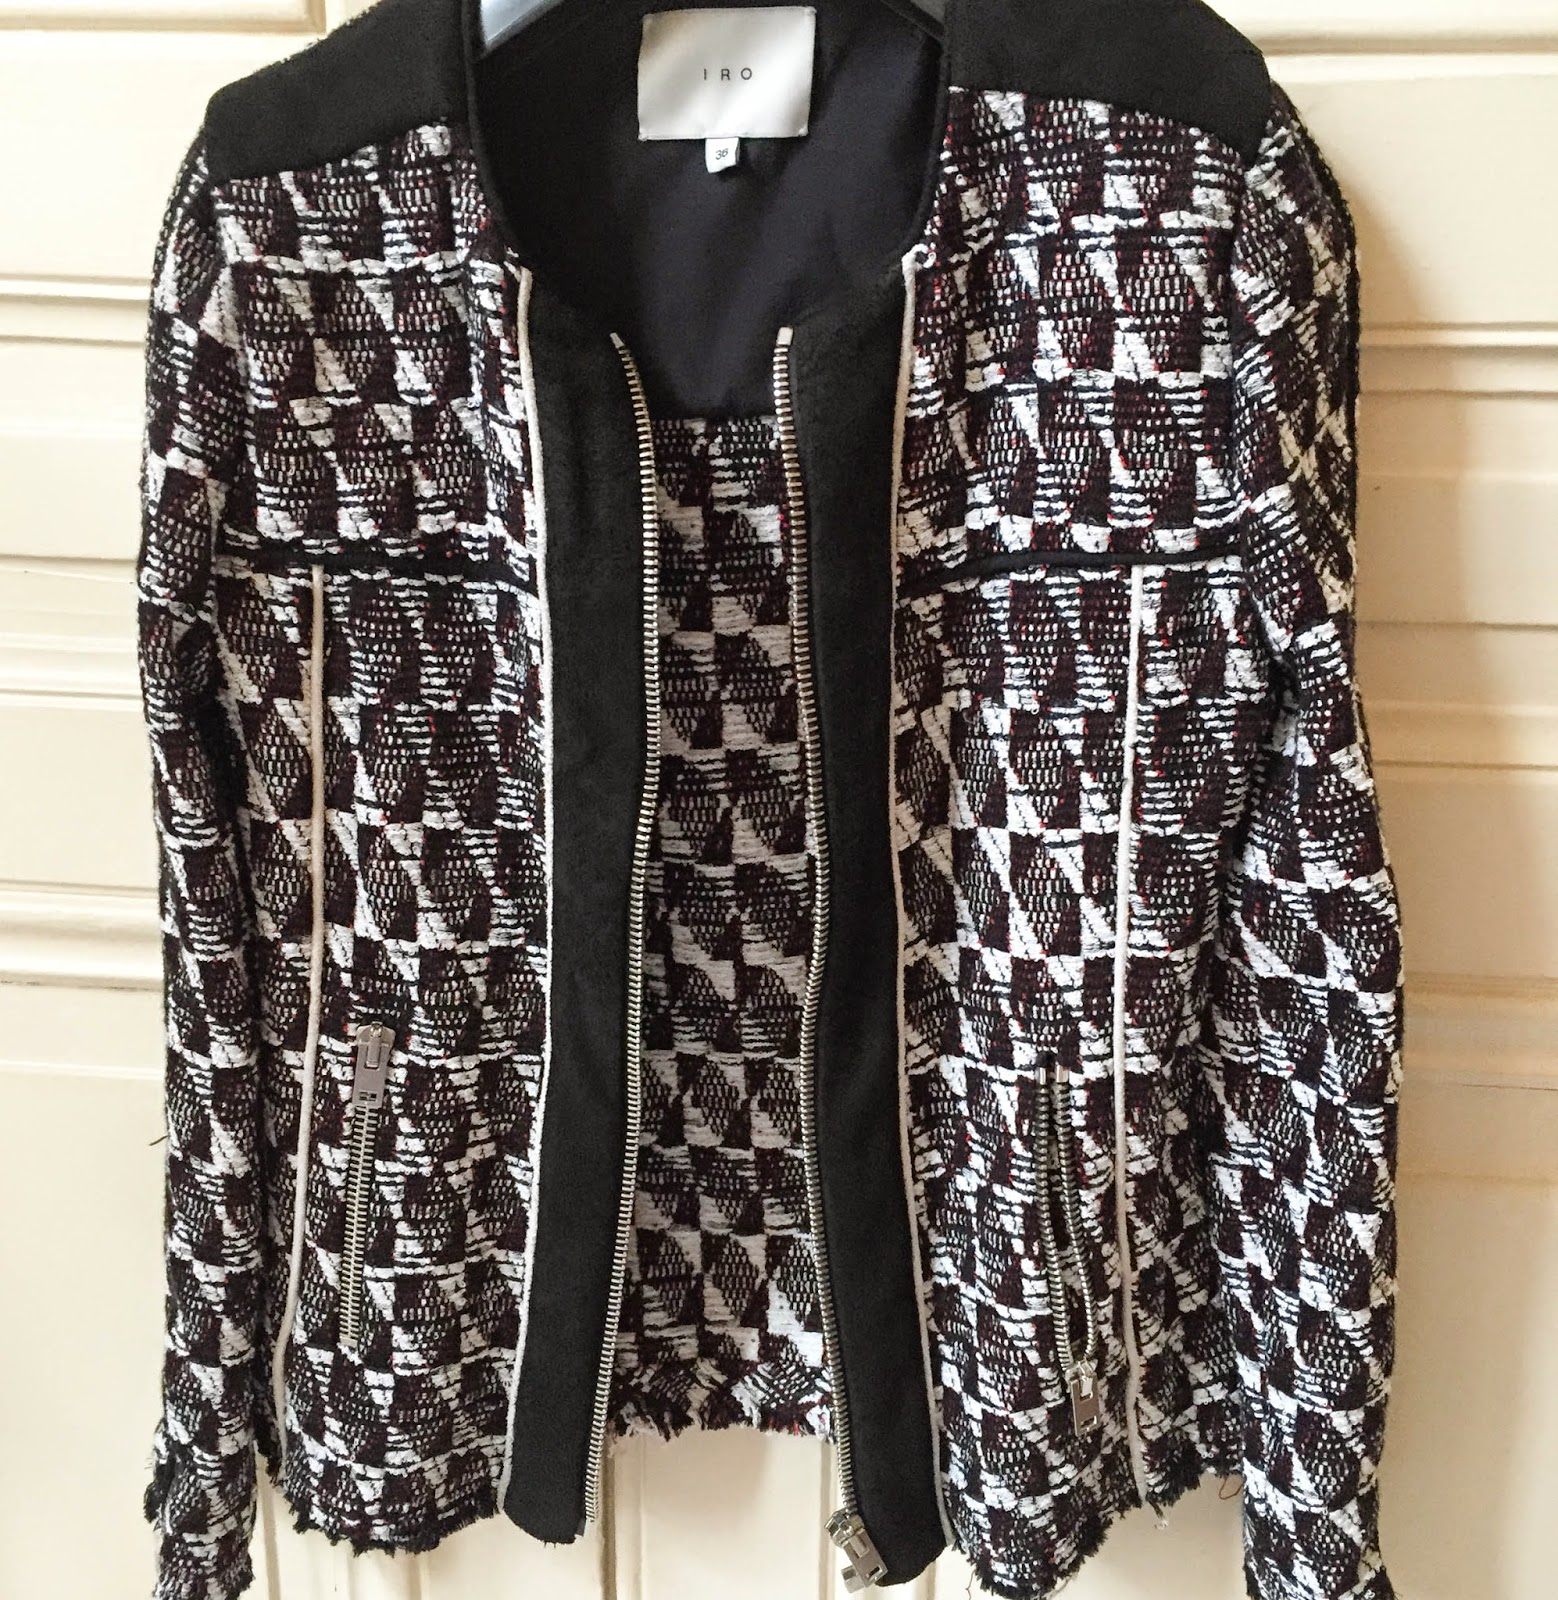 Iro jacket, giveaway, contest, fashion blogger, iro